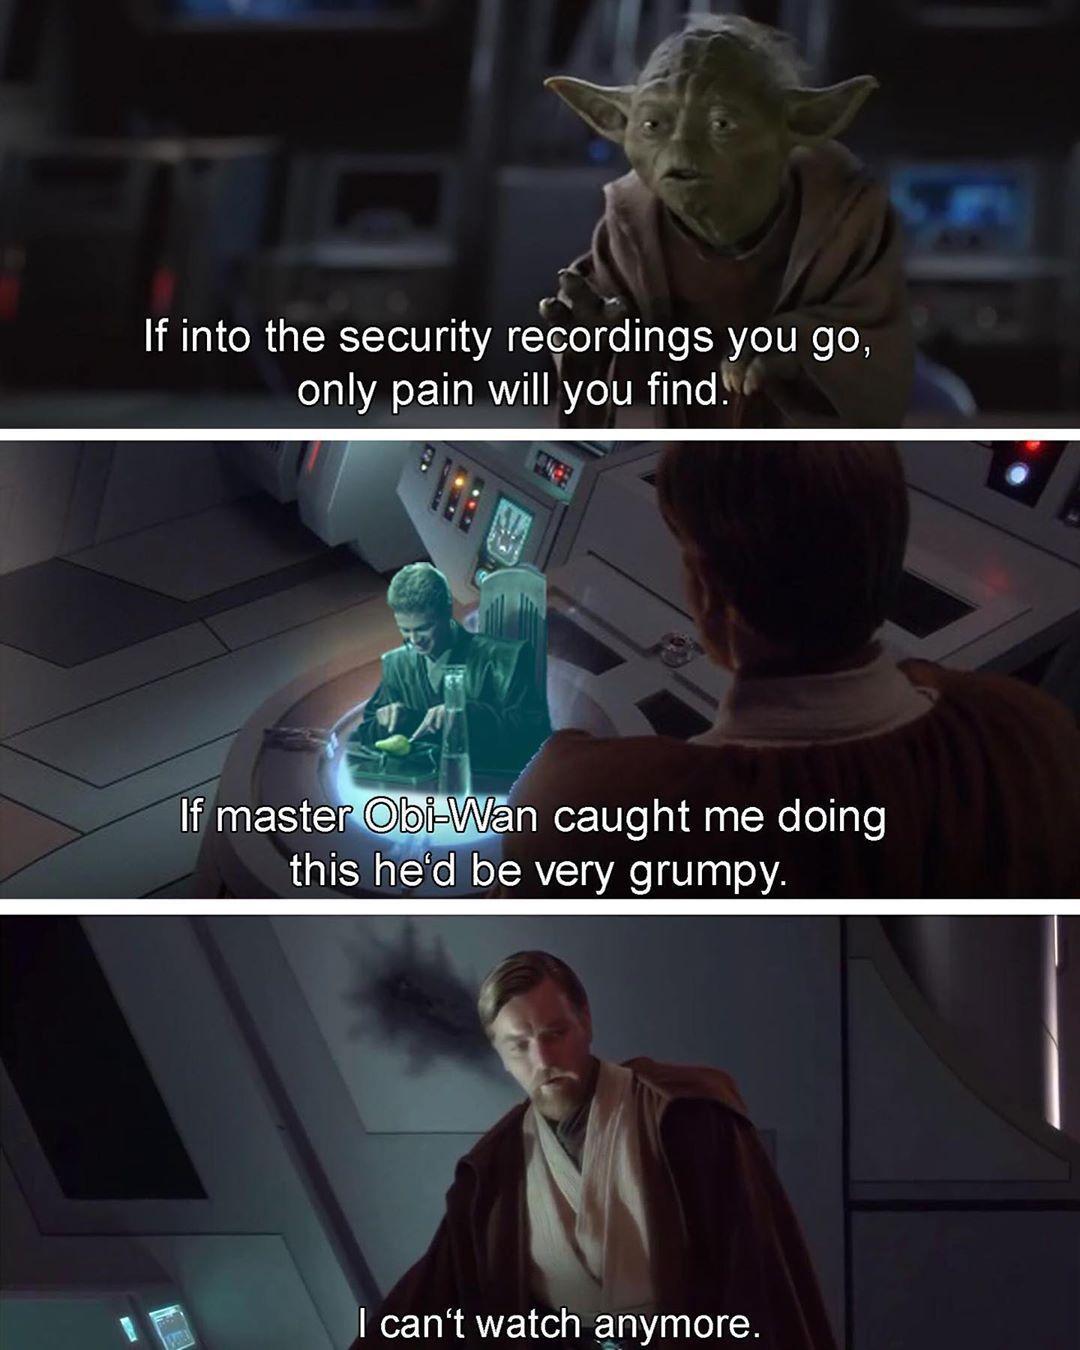 Star Wars Star Wars Memes Prequel Memes Funny Star Wars Star Wars Memes Prequel Memes Star Wars Humor